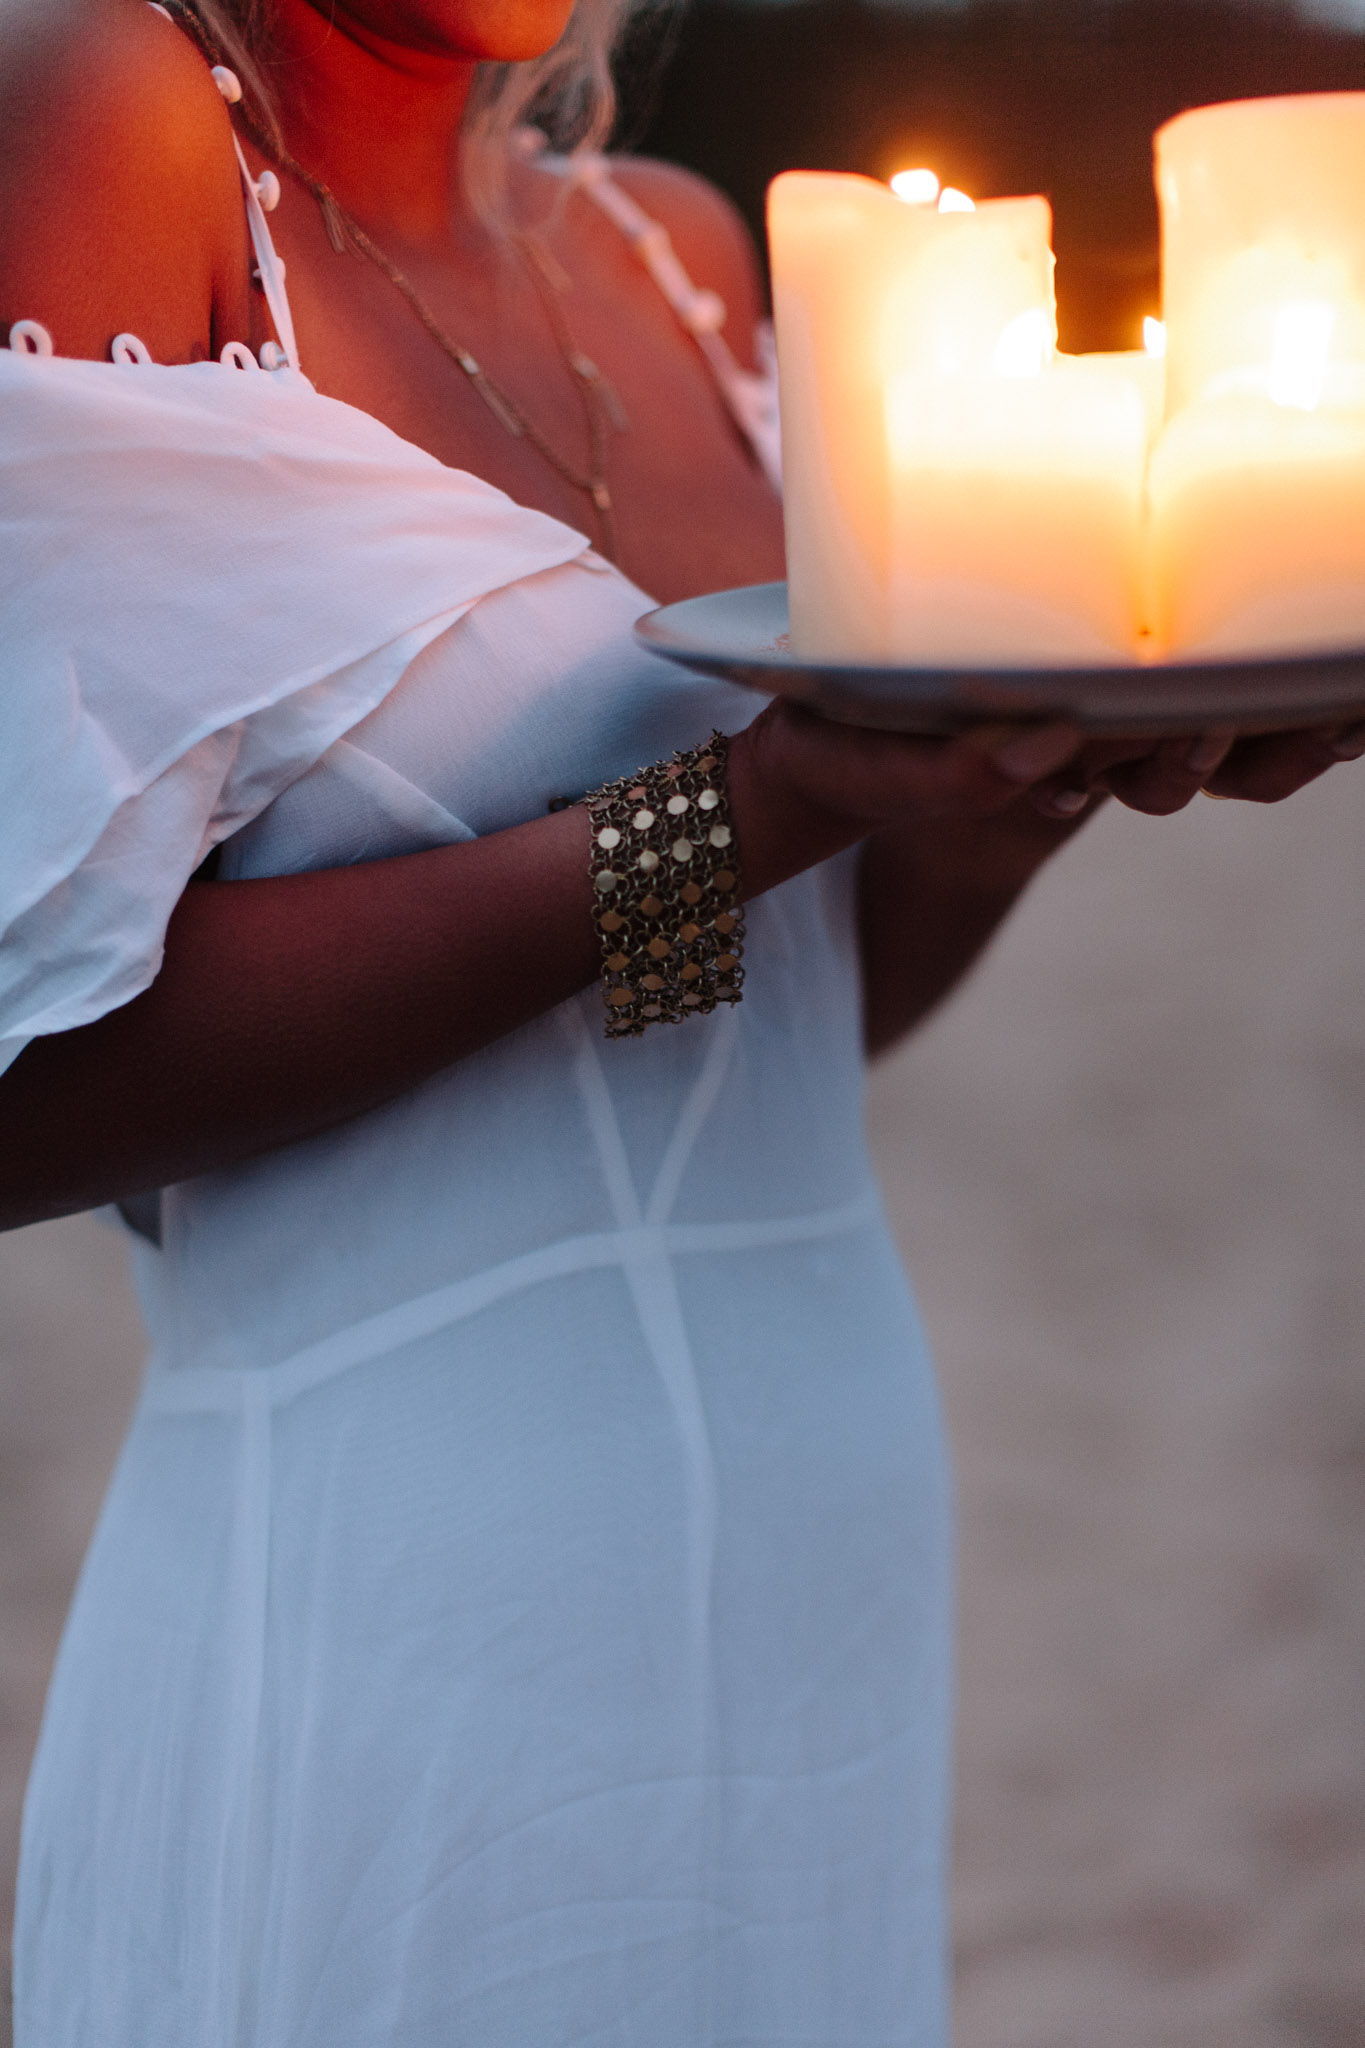 Speyer-Moroccan-Wedding-Inspiration-Pia-Anna-Christian-Wedding-Photography-S-84.jpg